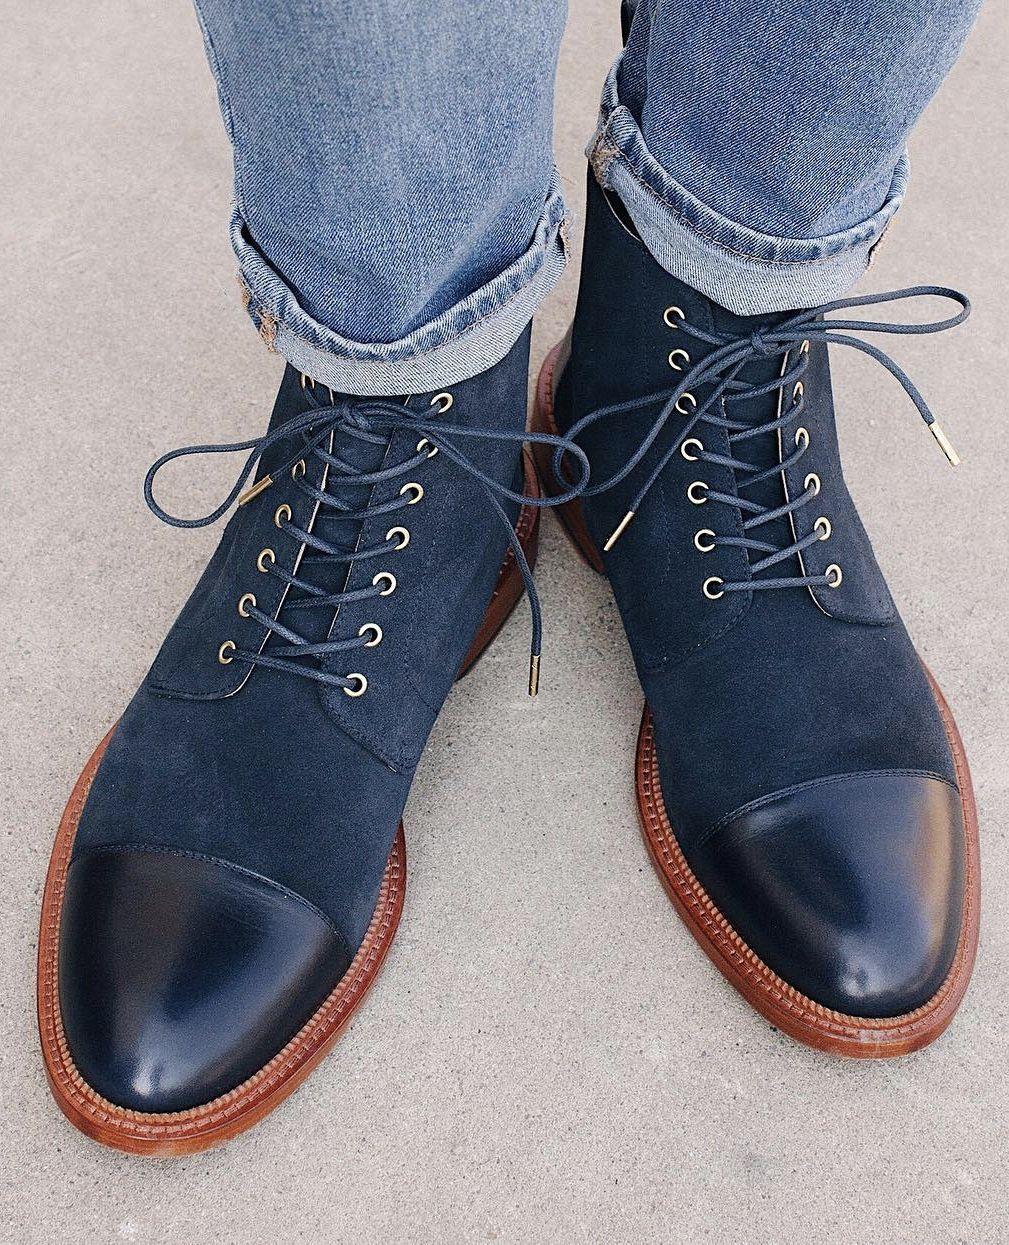 New Navy Jack Boots from Taft Clothing  taft  boots  taftclothing   jackboots   de8f75ad70